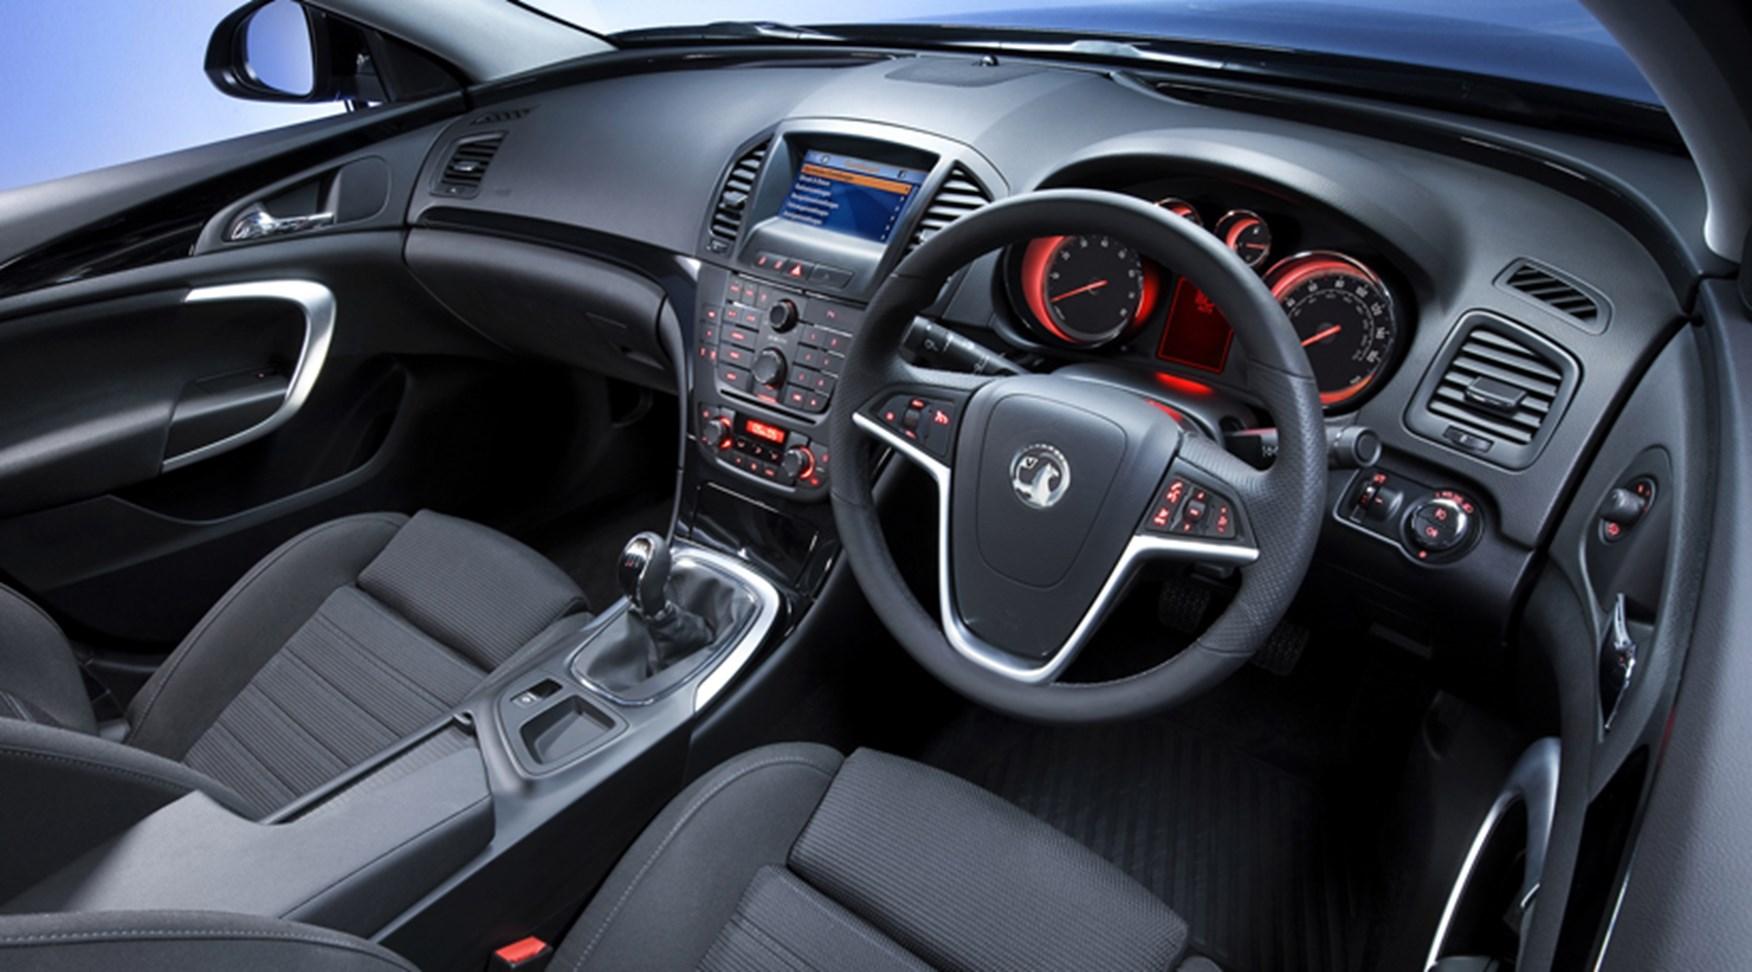 Astra F Gsi Interior >> Vauxhall Insignia interior: first pictures | CAR Magazine